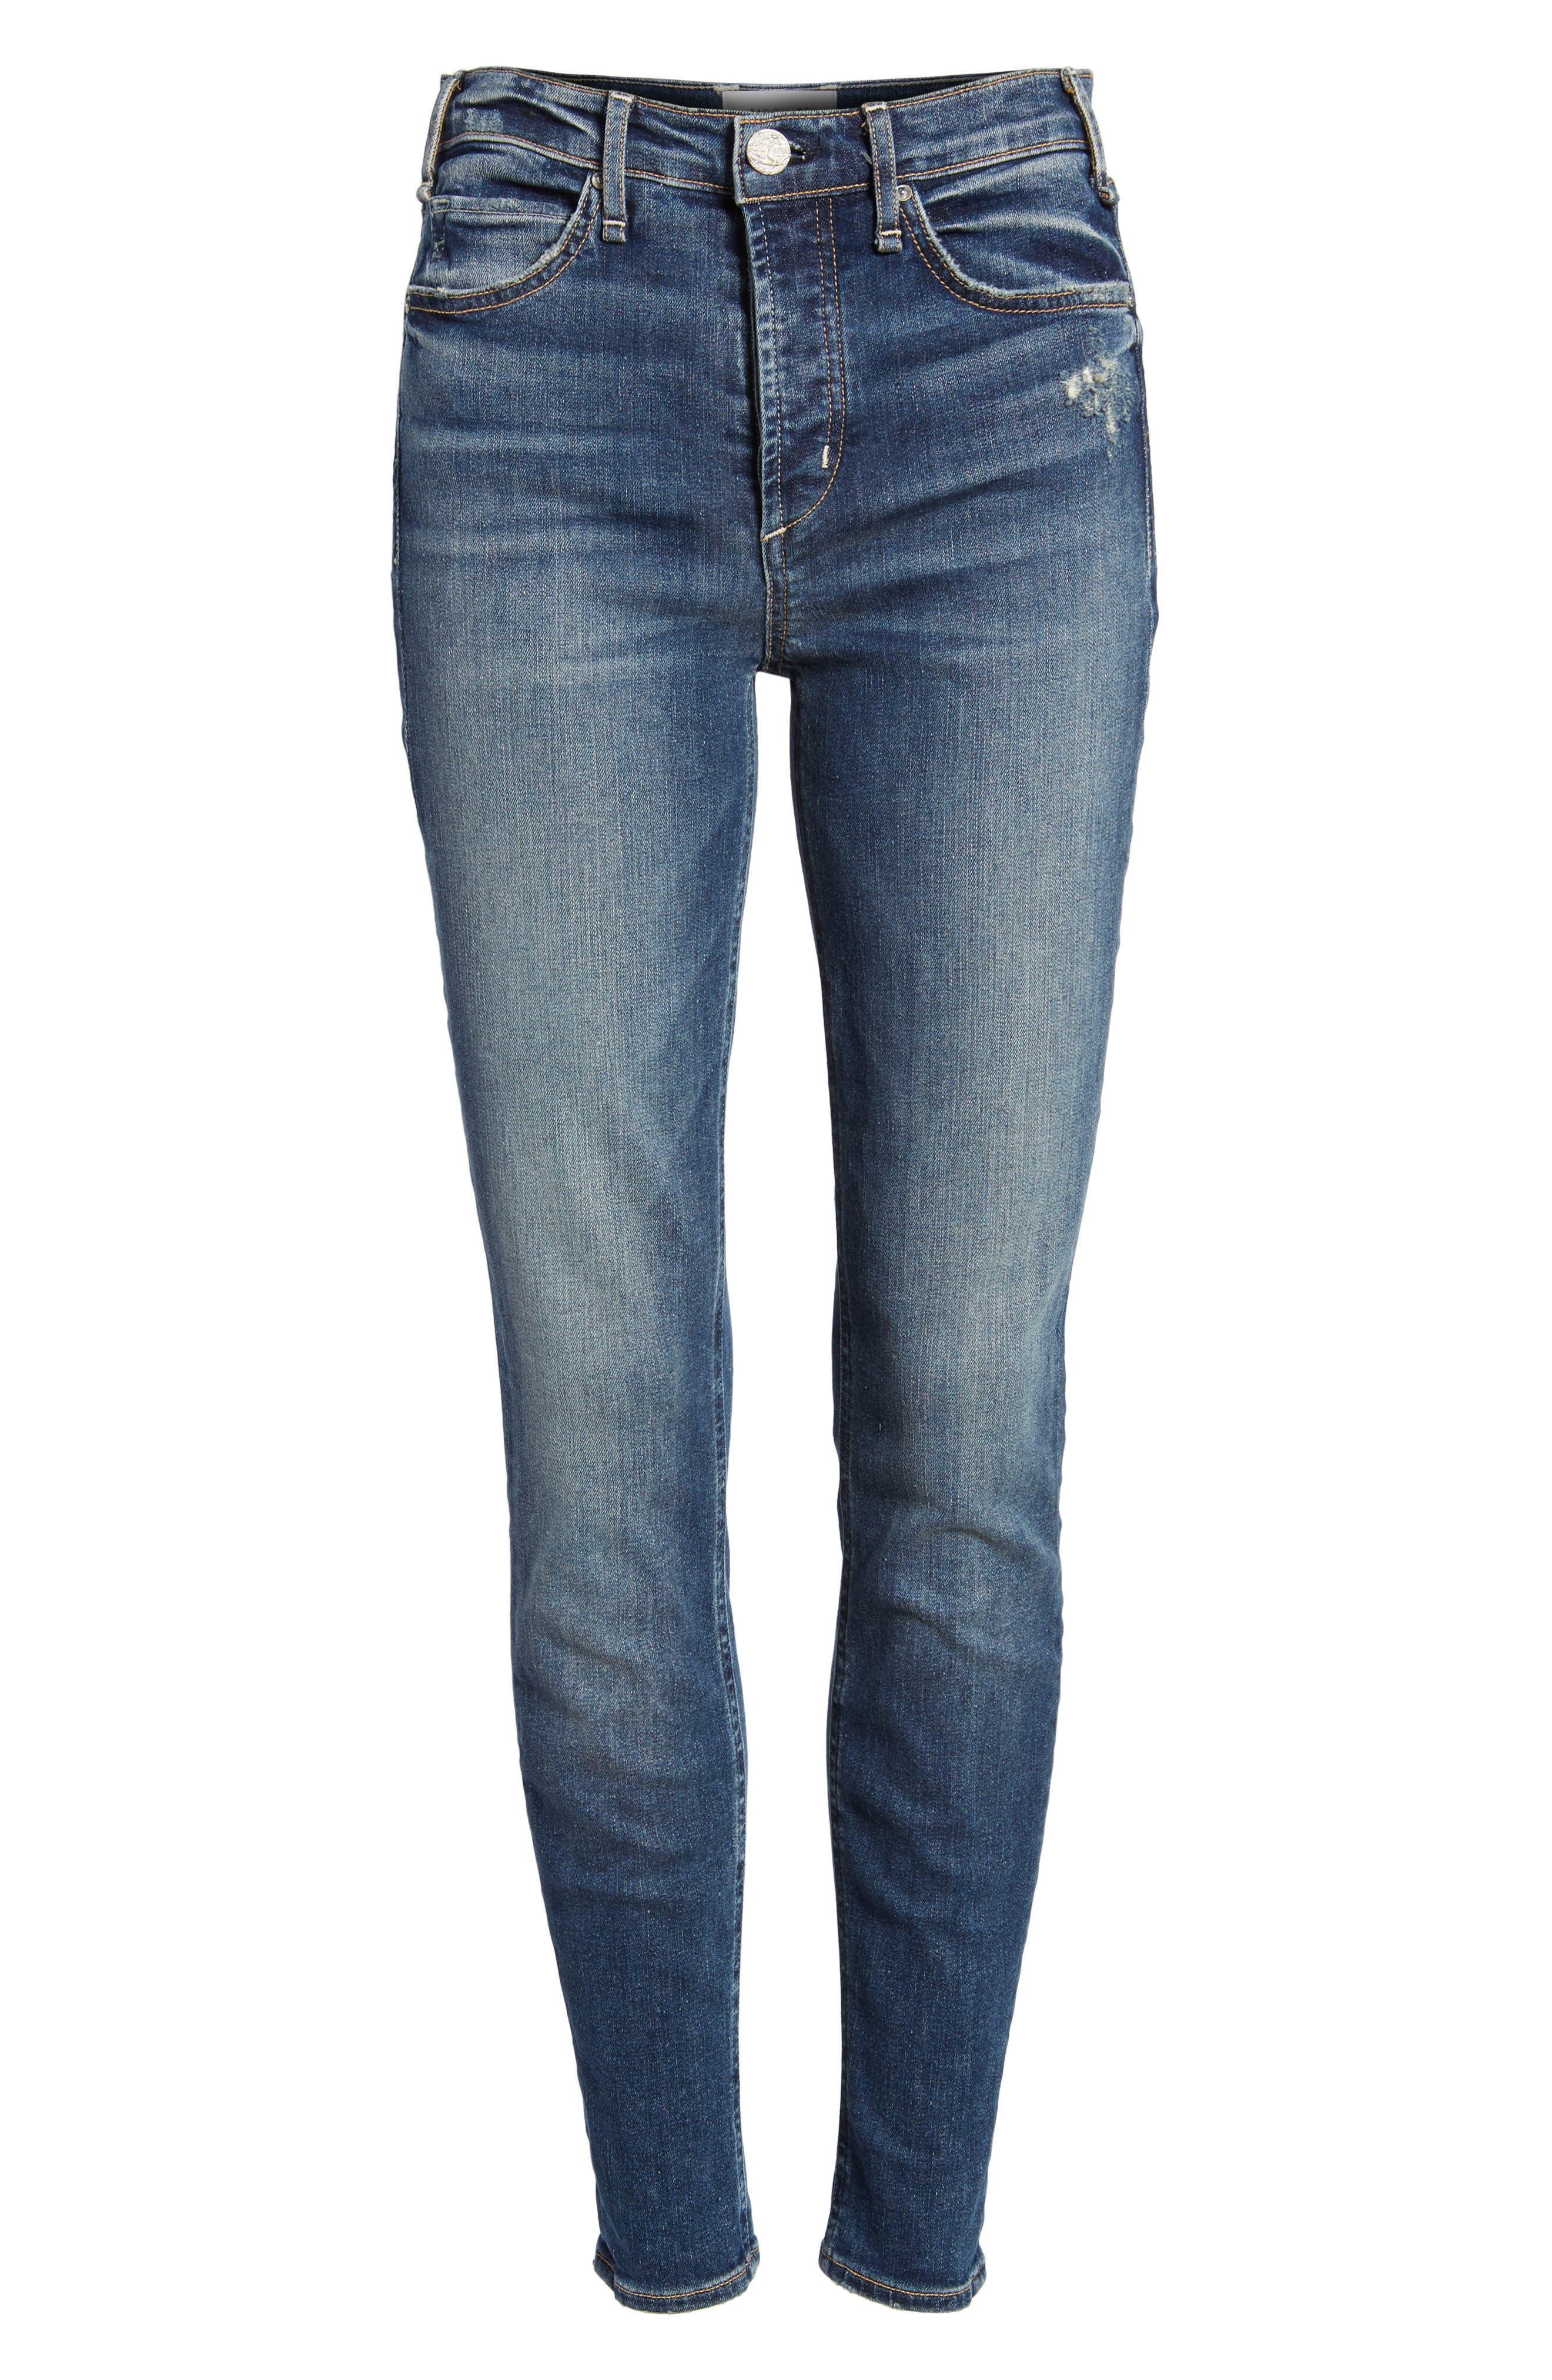 Newton High Rise Skinny Jeans,                             Alternate thumbnail 7, color,                             420